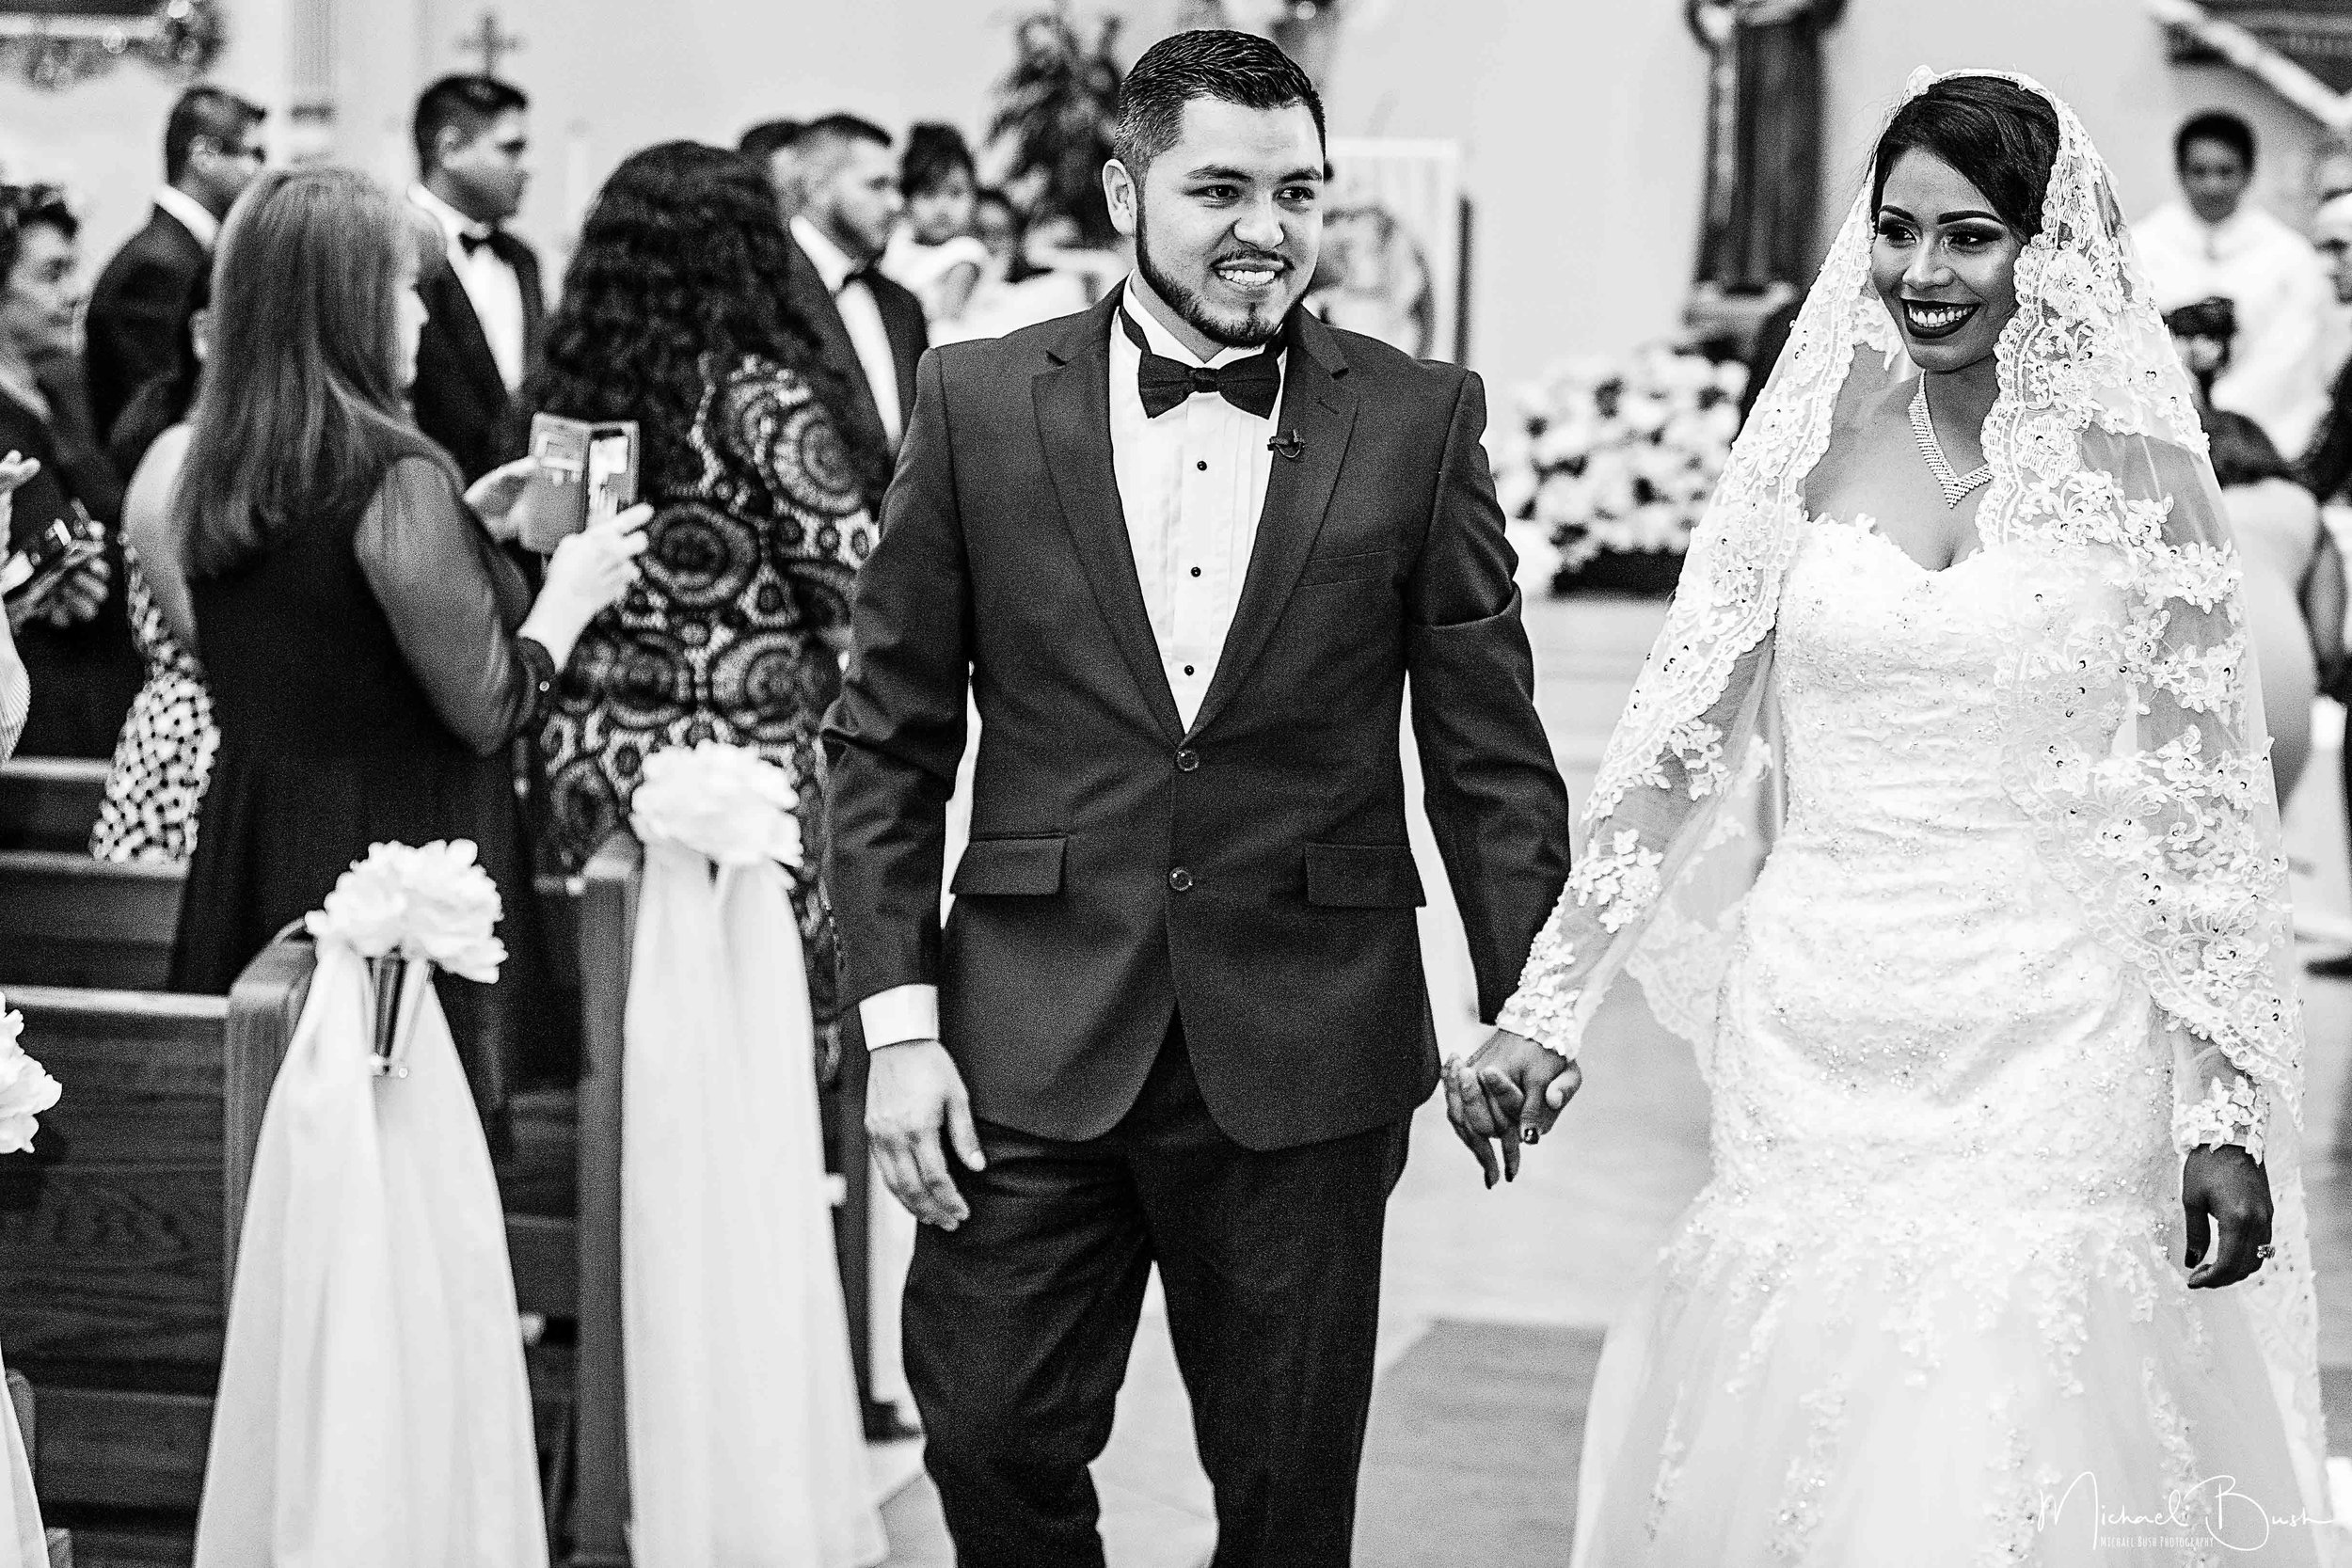 Wedding-Details-Bride-Fort Worth-colors-Ceremony-weddingceremony-brides-groom-ido-church-happy-wedo.jpg